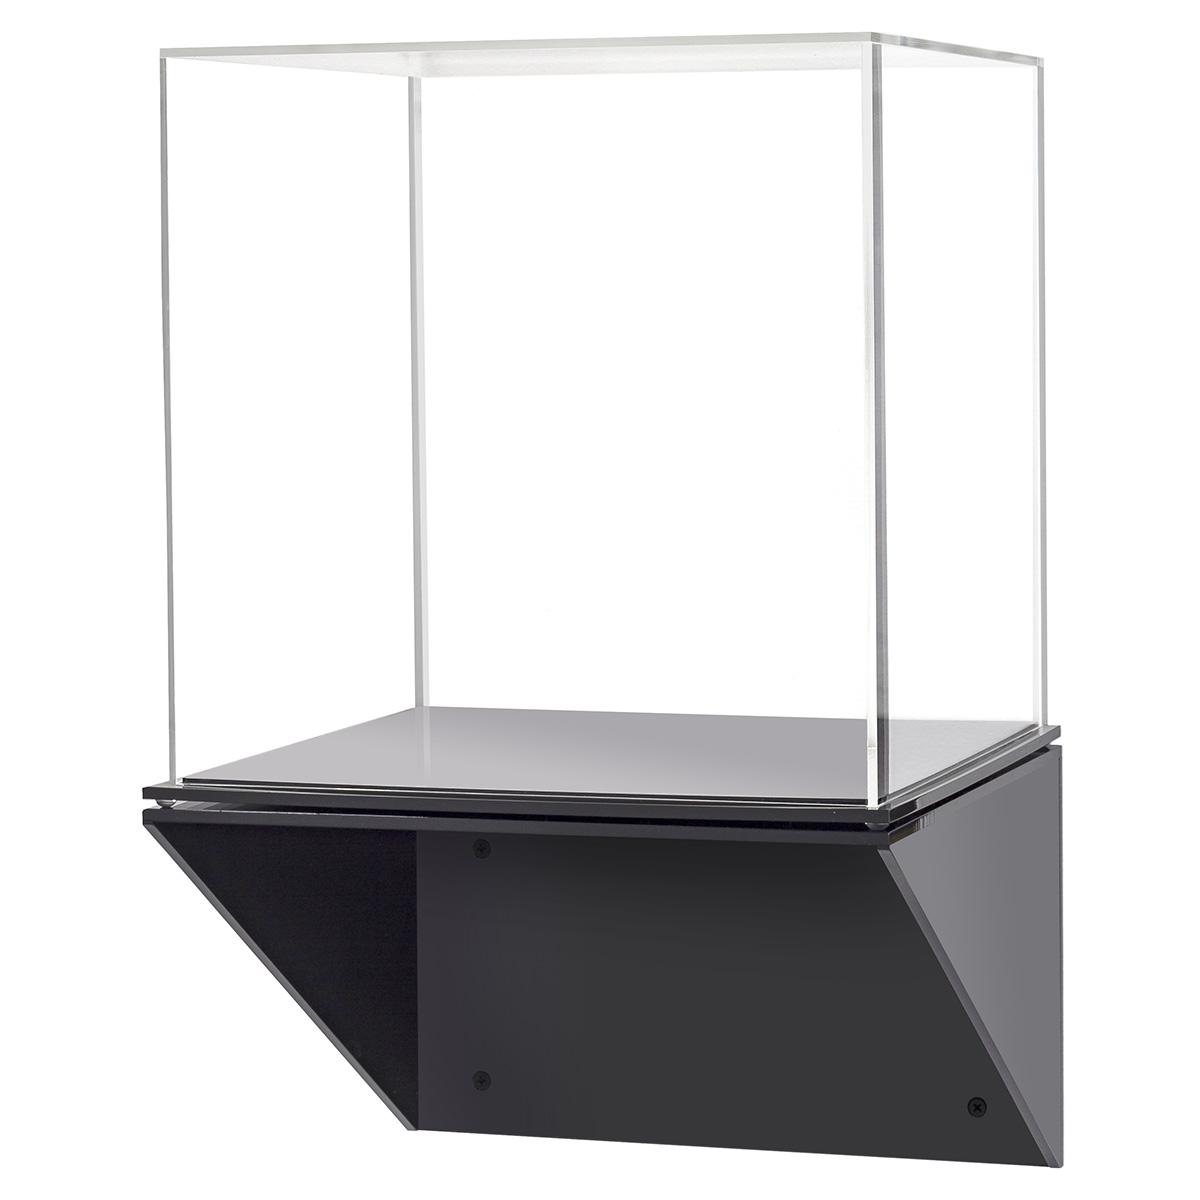 Acrylic Display Case With Black Wall Mount Shelf